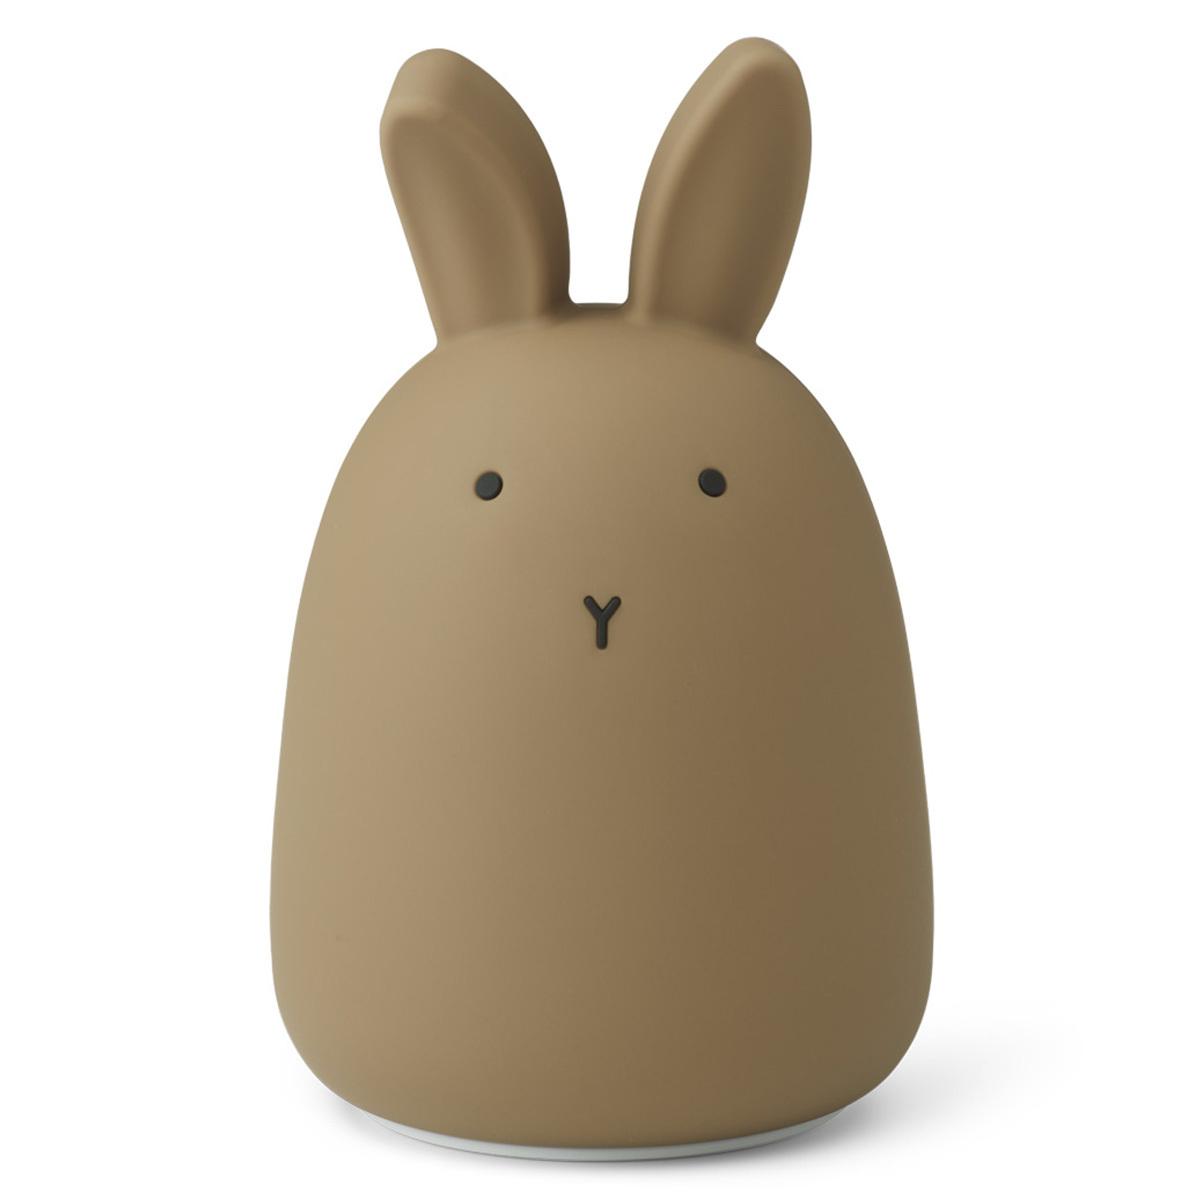 Veilleuse Veilleuse Winston - Rabbit Oat Veilleuse Winston - Rabbit Oat